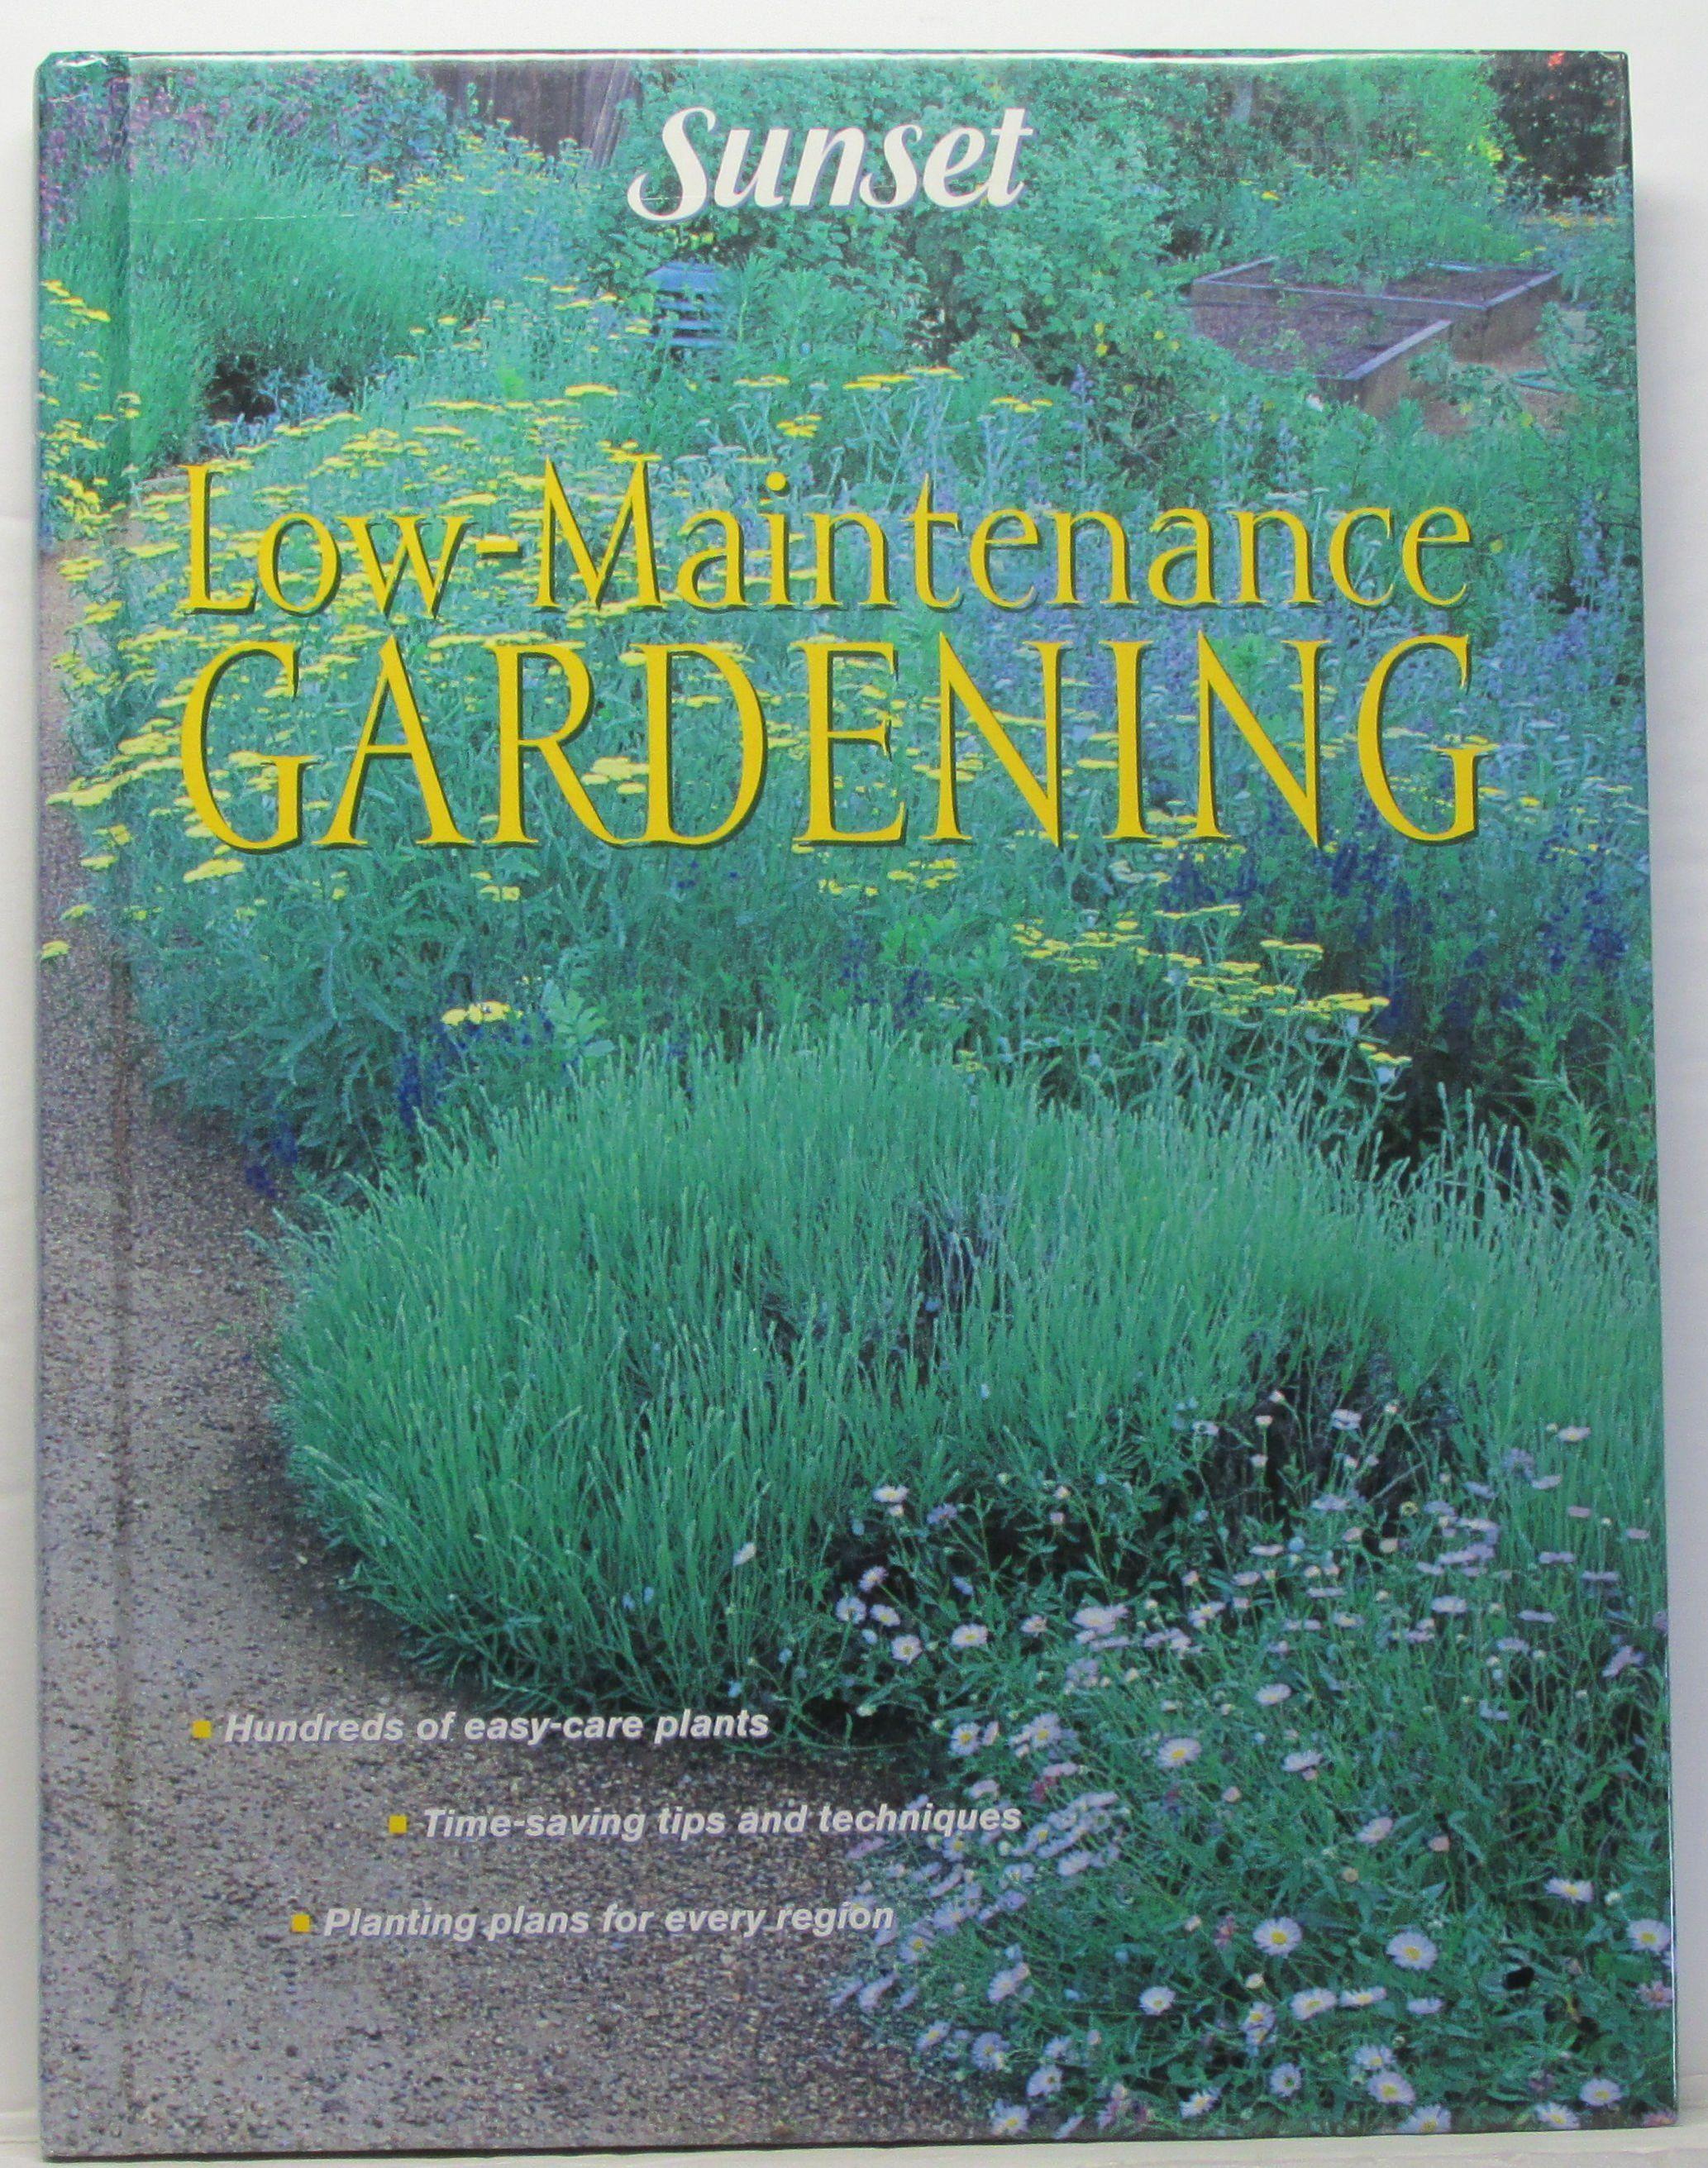 Low Maintenance Gardening Sunset Rose City Books In 2020 Low Maintenance Easy Care Plants Planting Plan